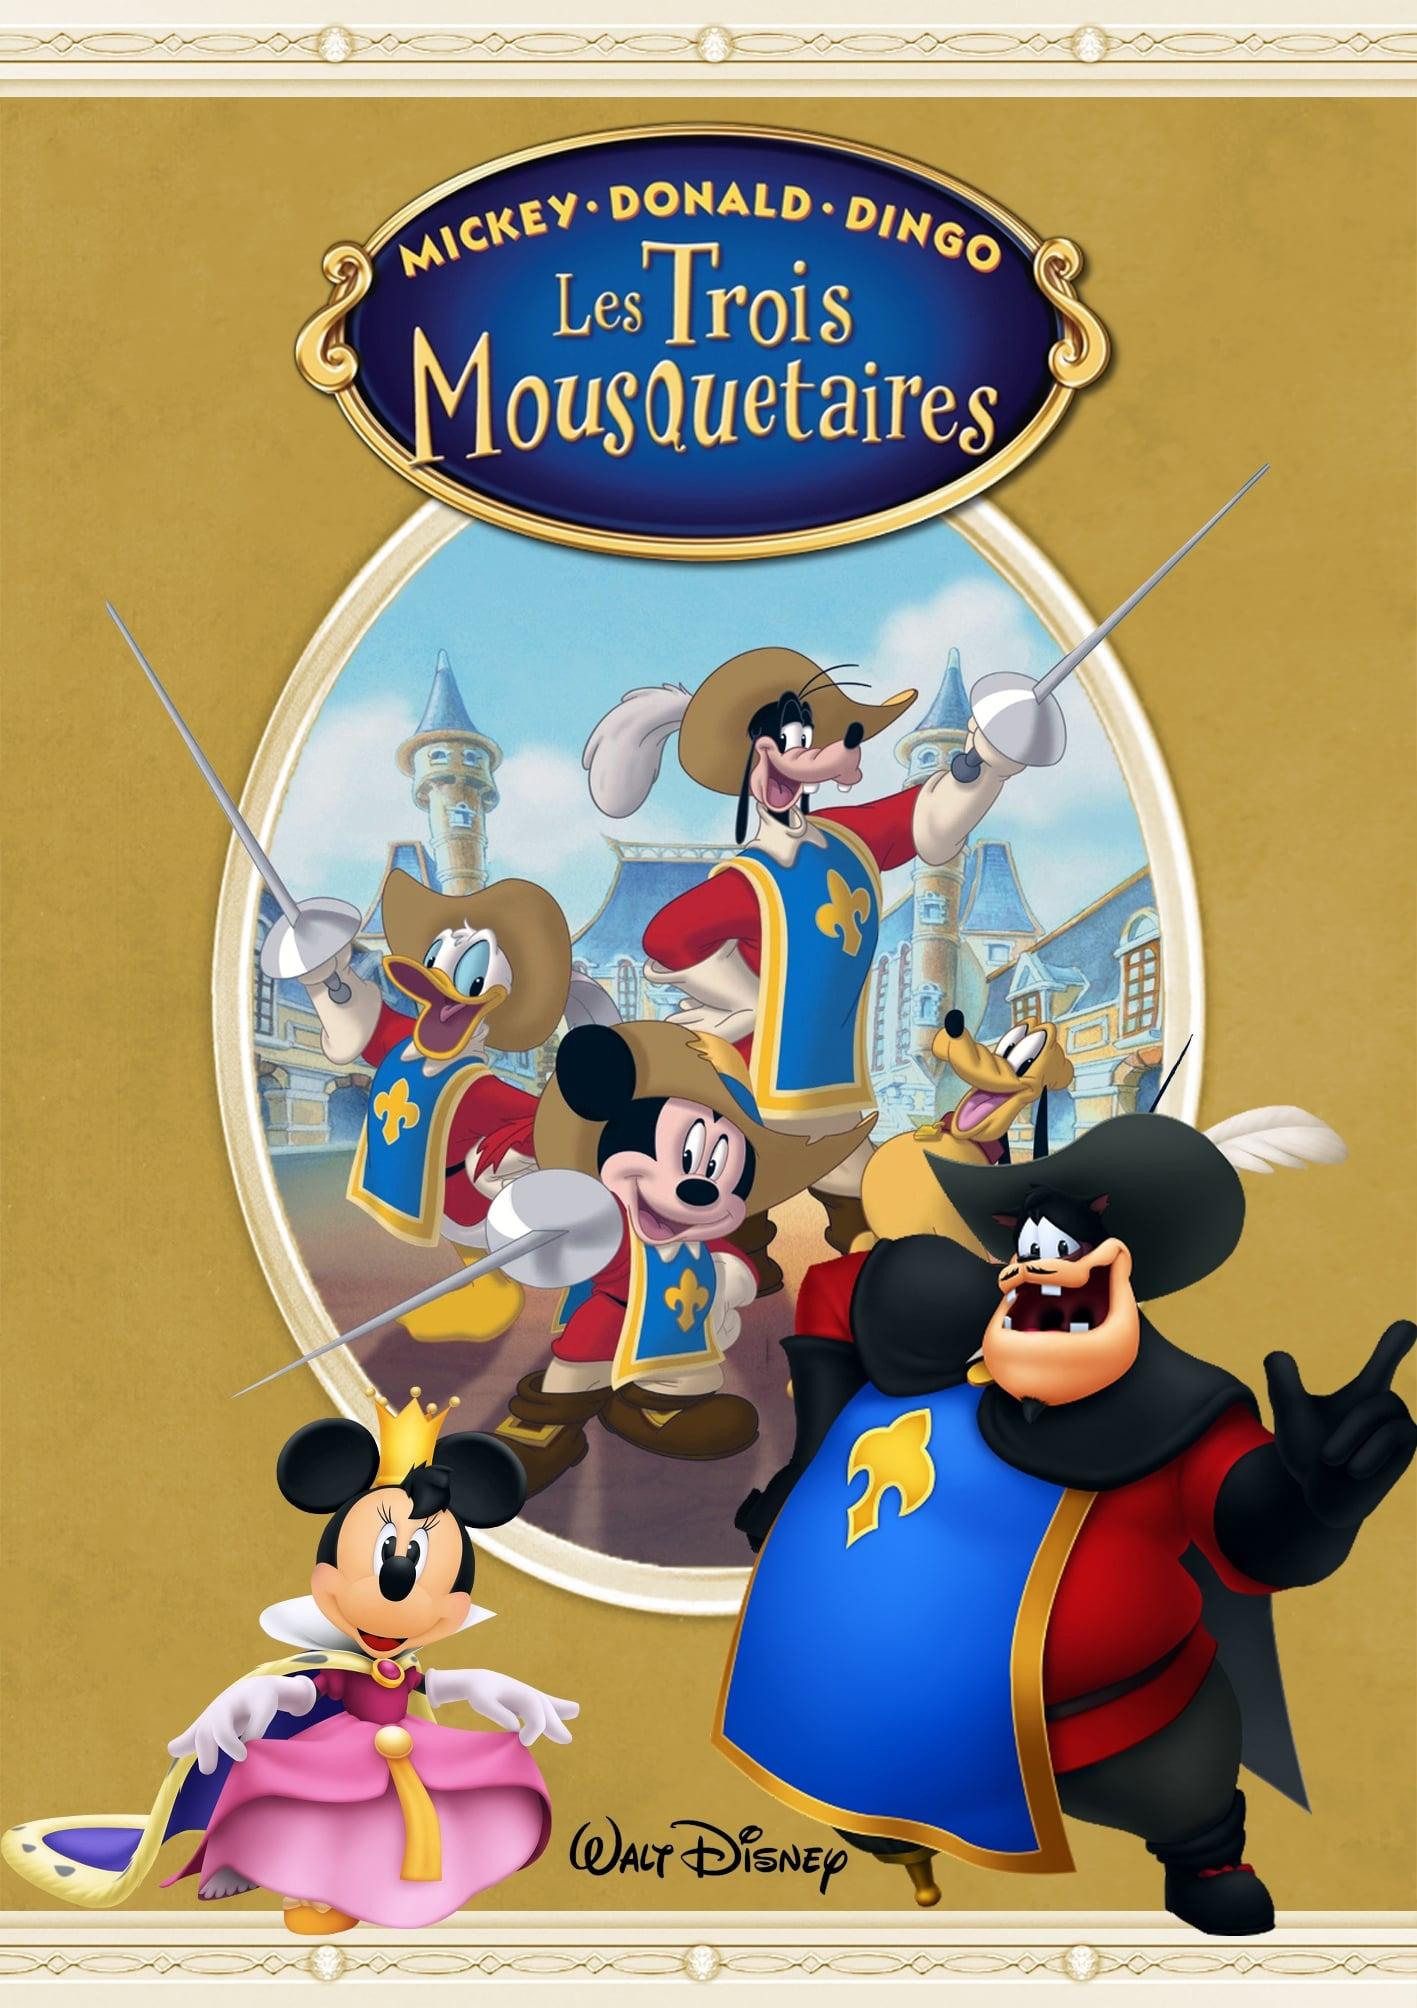 Mickey, Donald, Dingo : Les Trois Mousquetaires : mickey,, donald,, dingo, trois, mousquetaires, Mickey,, Donald,, Dingo, Trois, Mousquetaires, (2004), Affiches, Movie, Database, (TMDb)